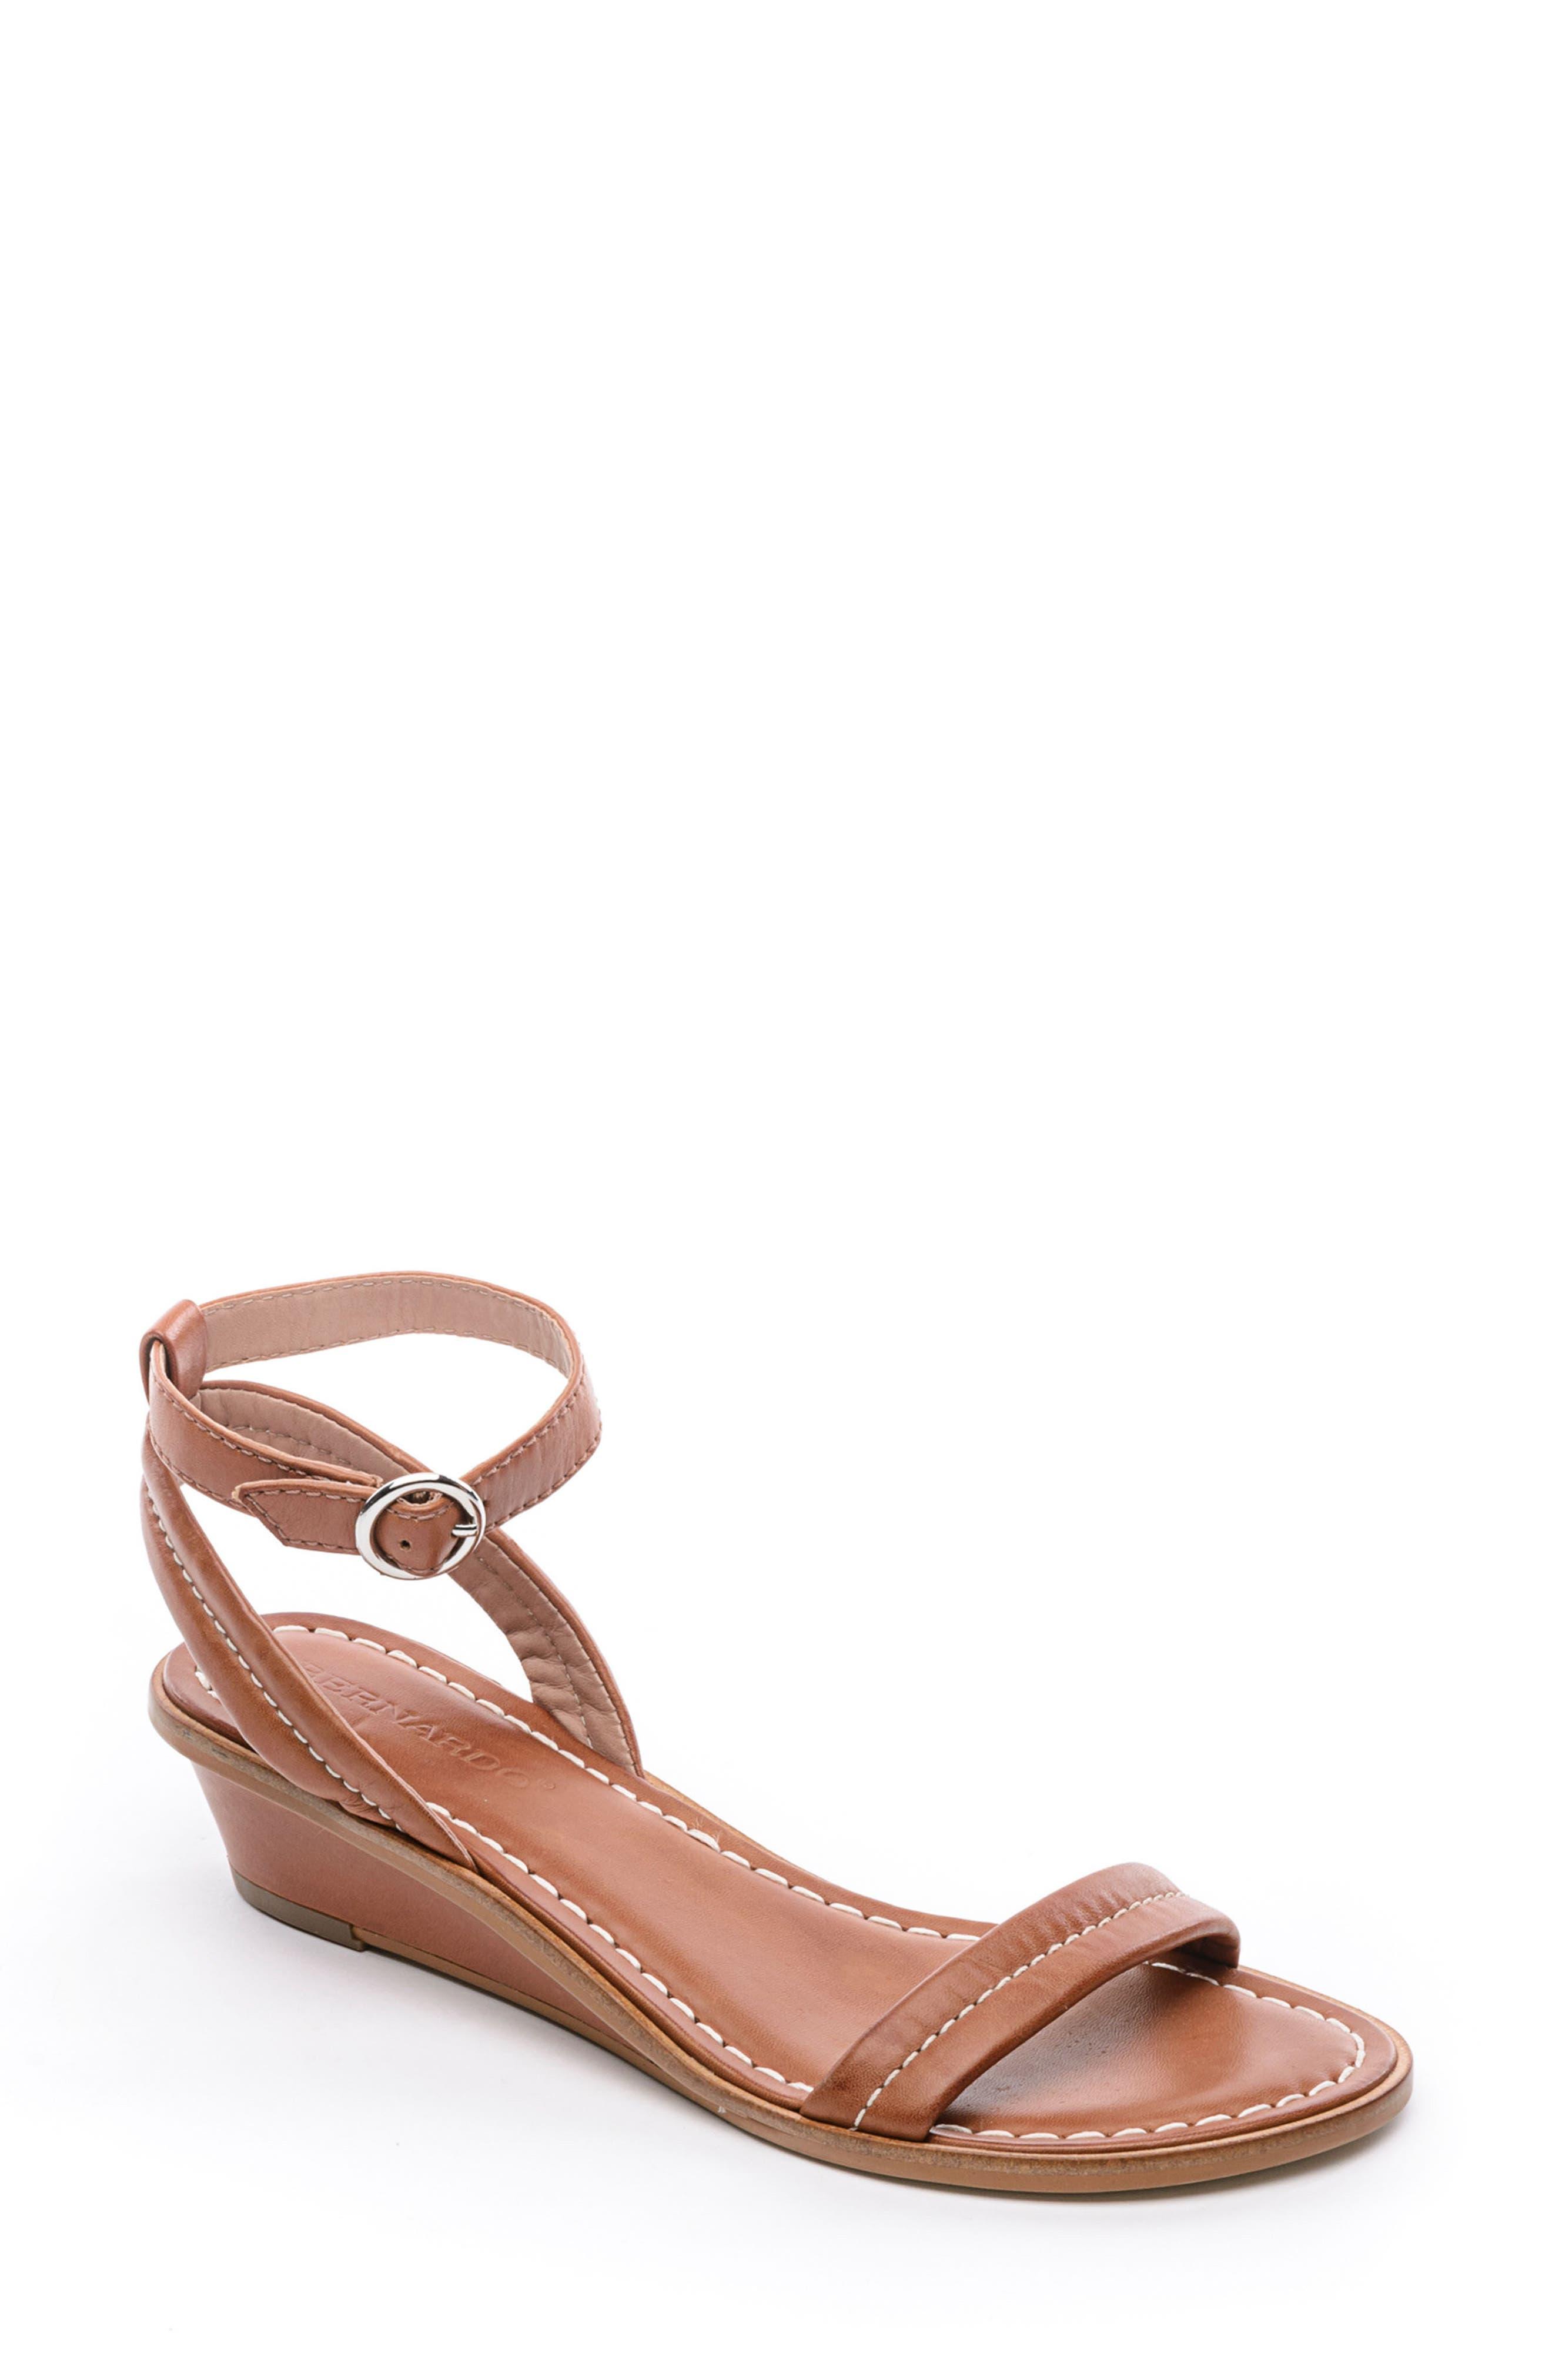 BERNARDO, Catherine Ankle Strap Sandal, Main thumbnail 1, color, LUGGAGE BROWN ANTIQUE